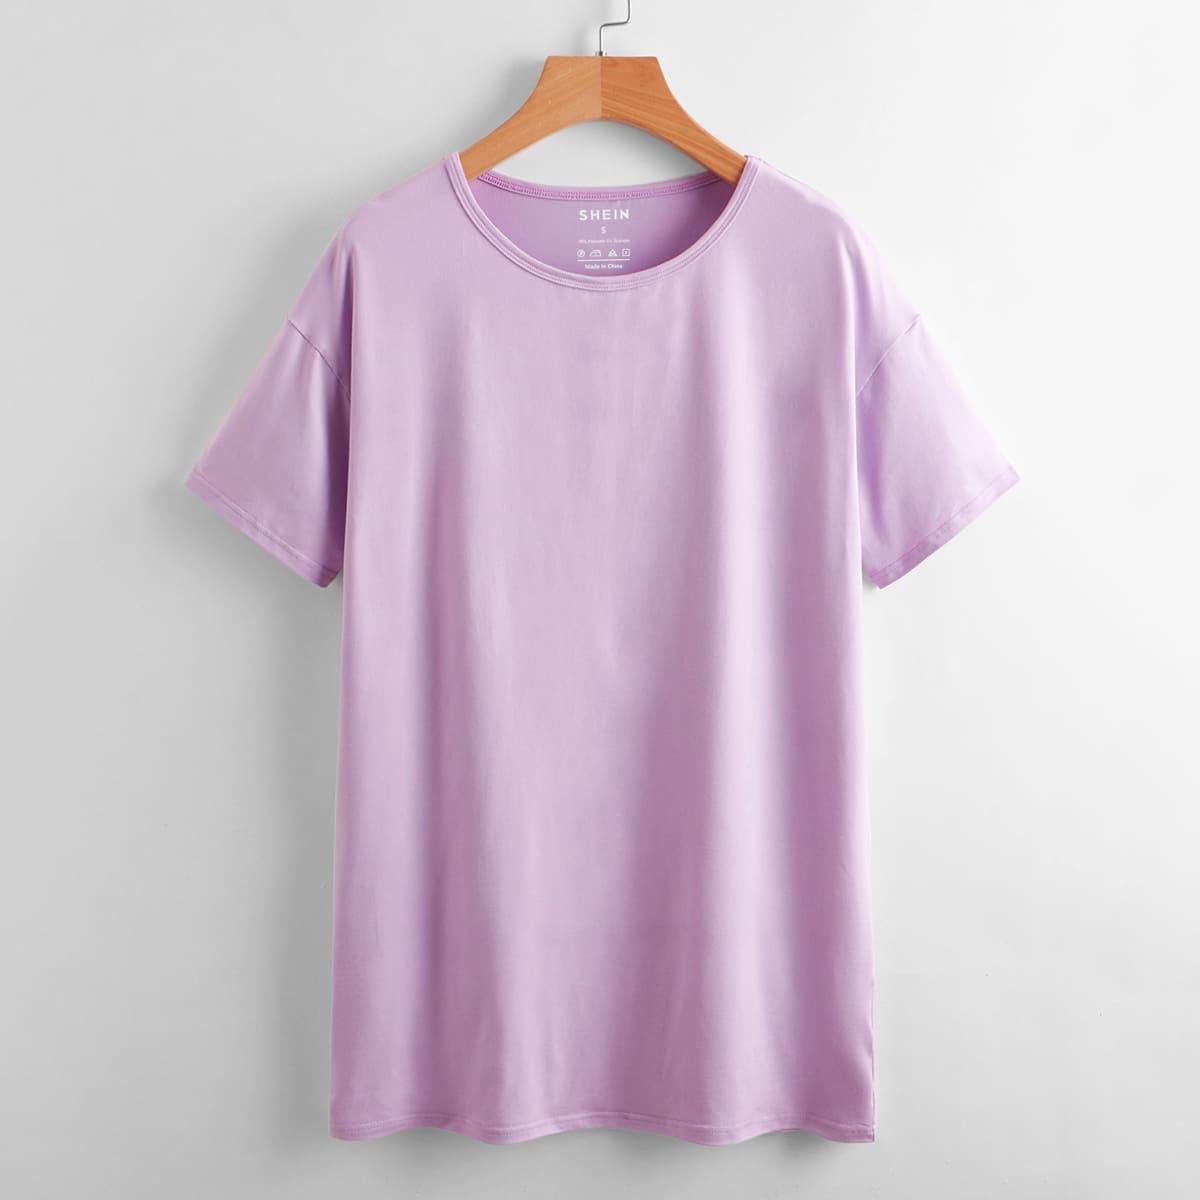 Однотонная футболка SheIn swtee24210601776